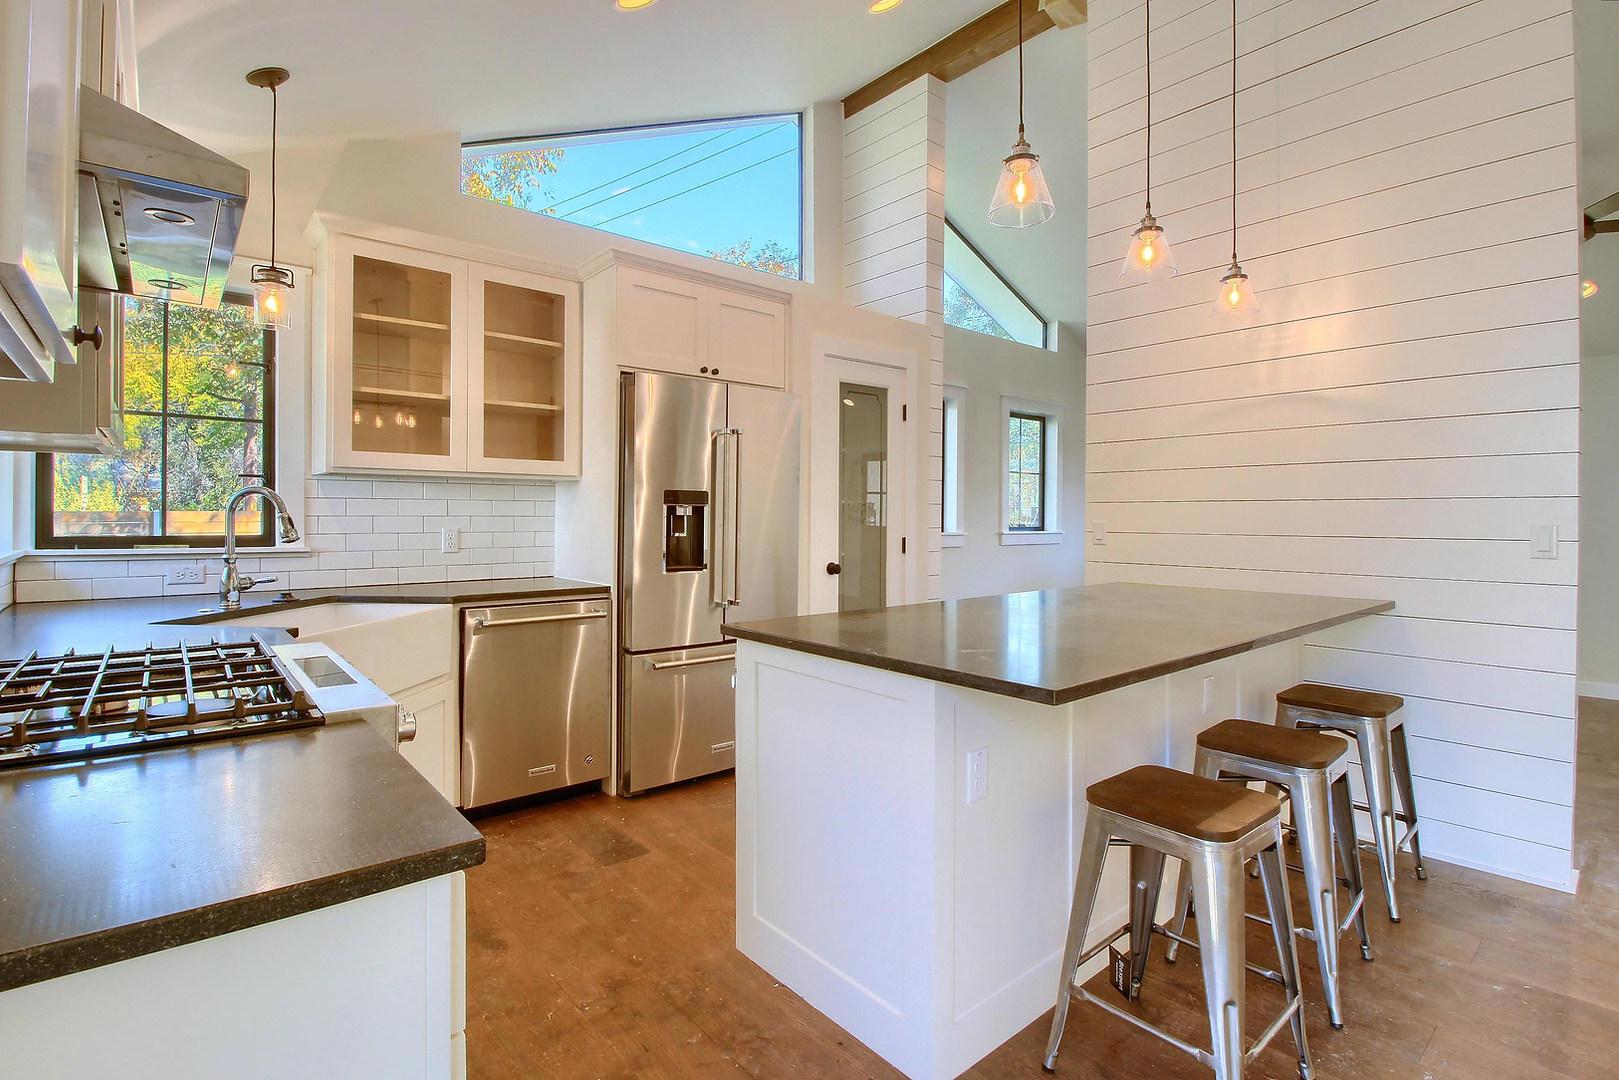 Home Renovation Custom Cabinetry on Bouldin in Austin, TX